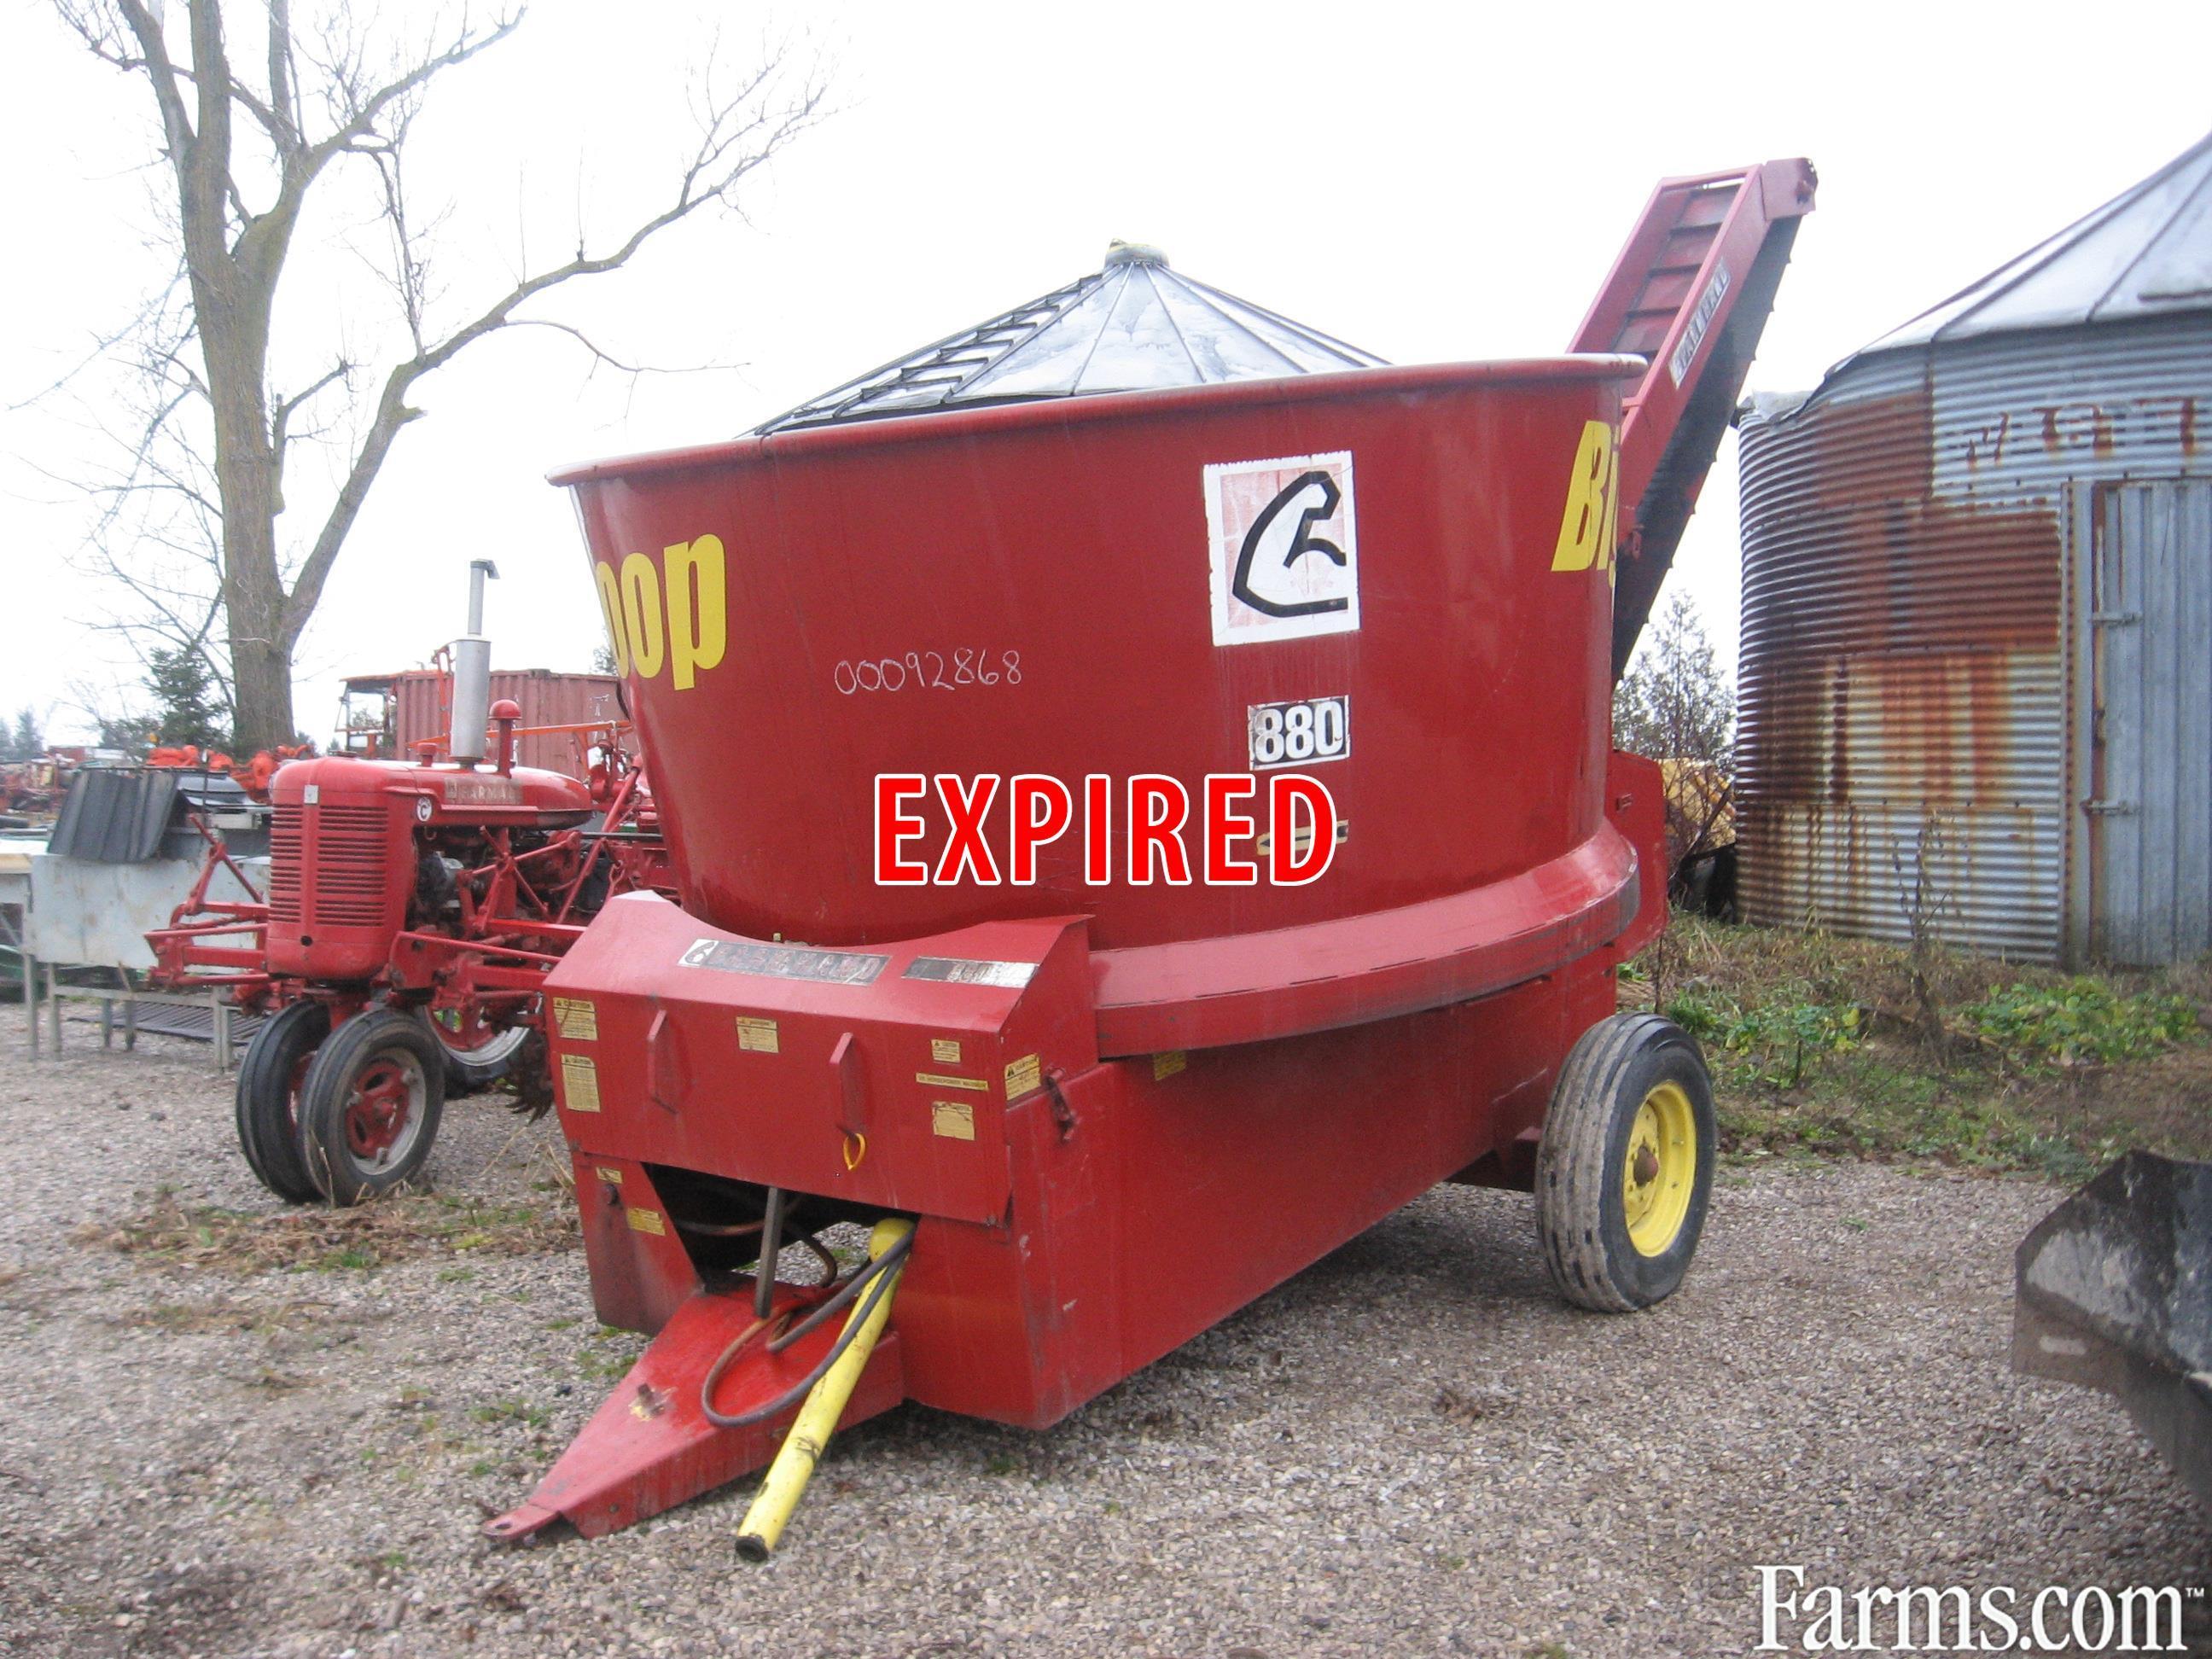 Farm Machinery Belts : Farm hand bale chopper with belt unload conveyor for sale farms